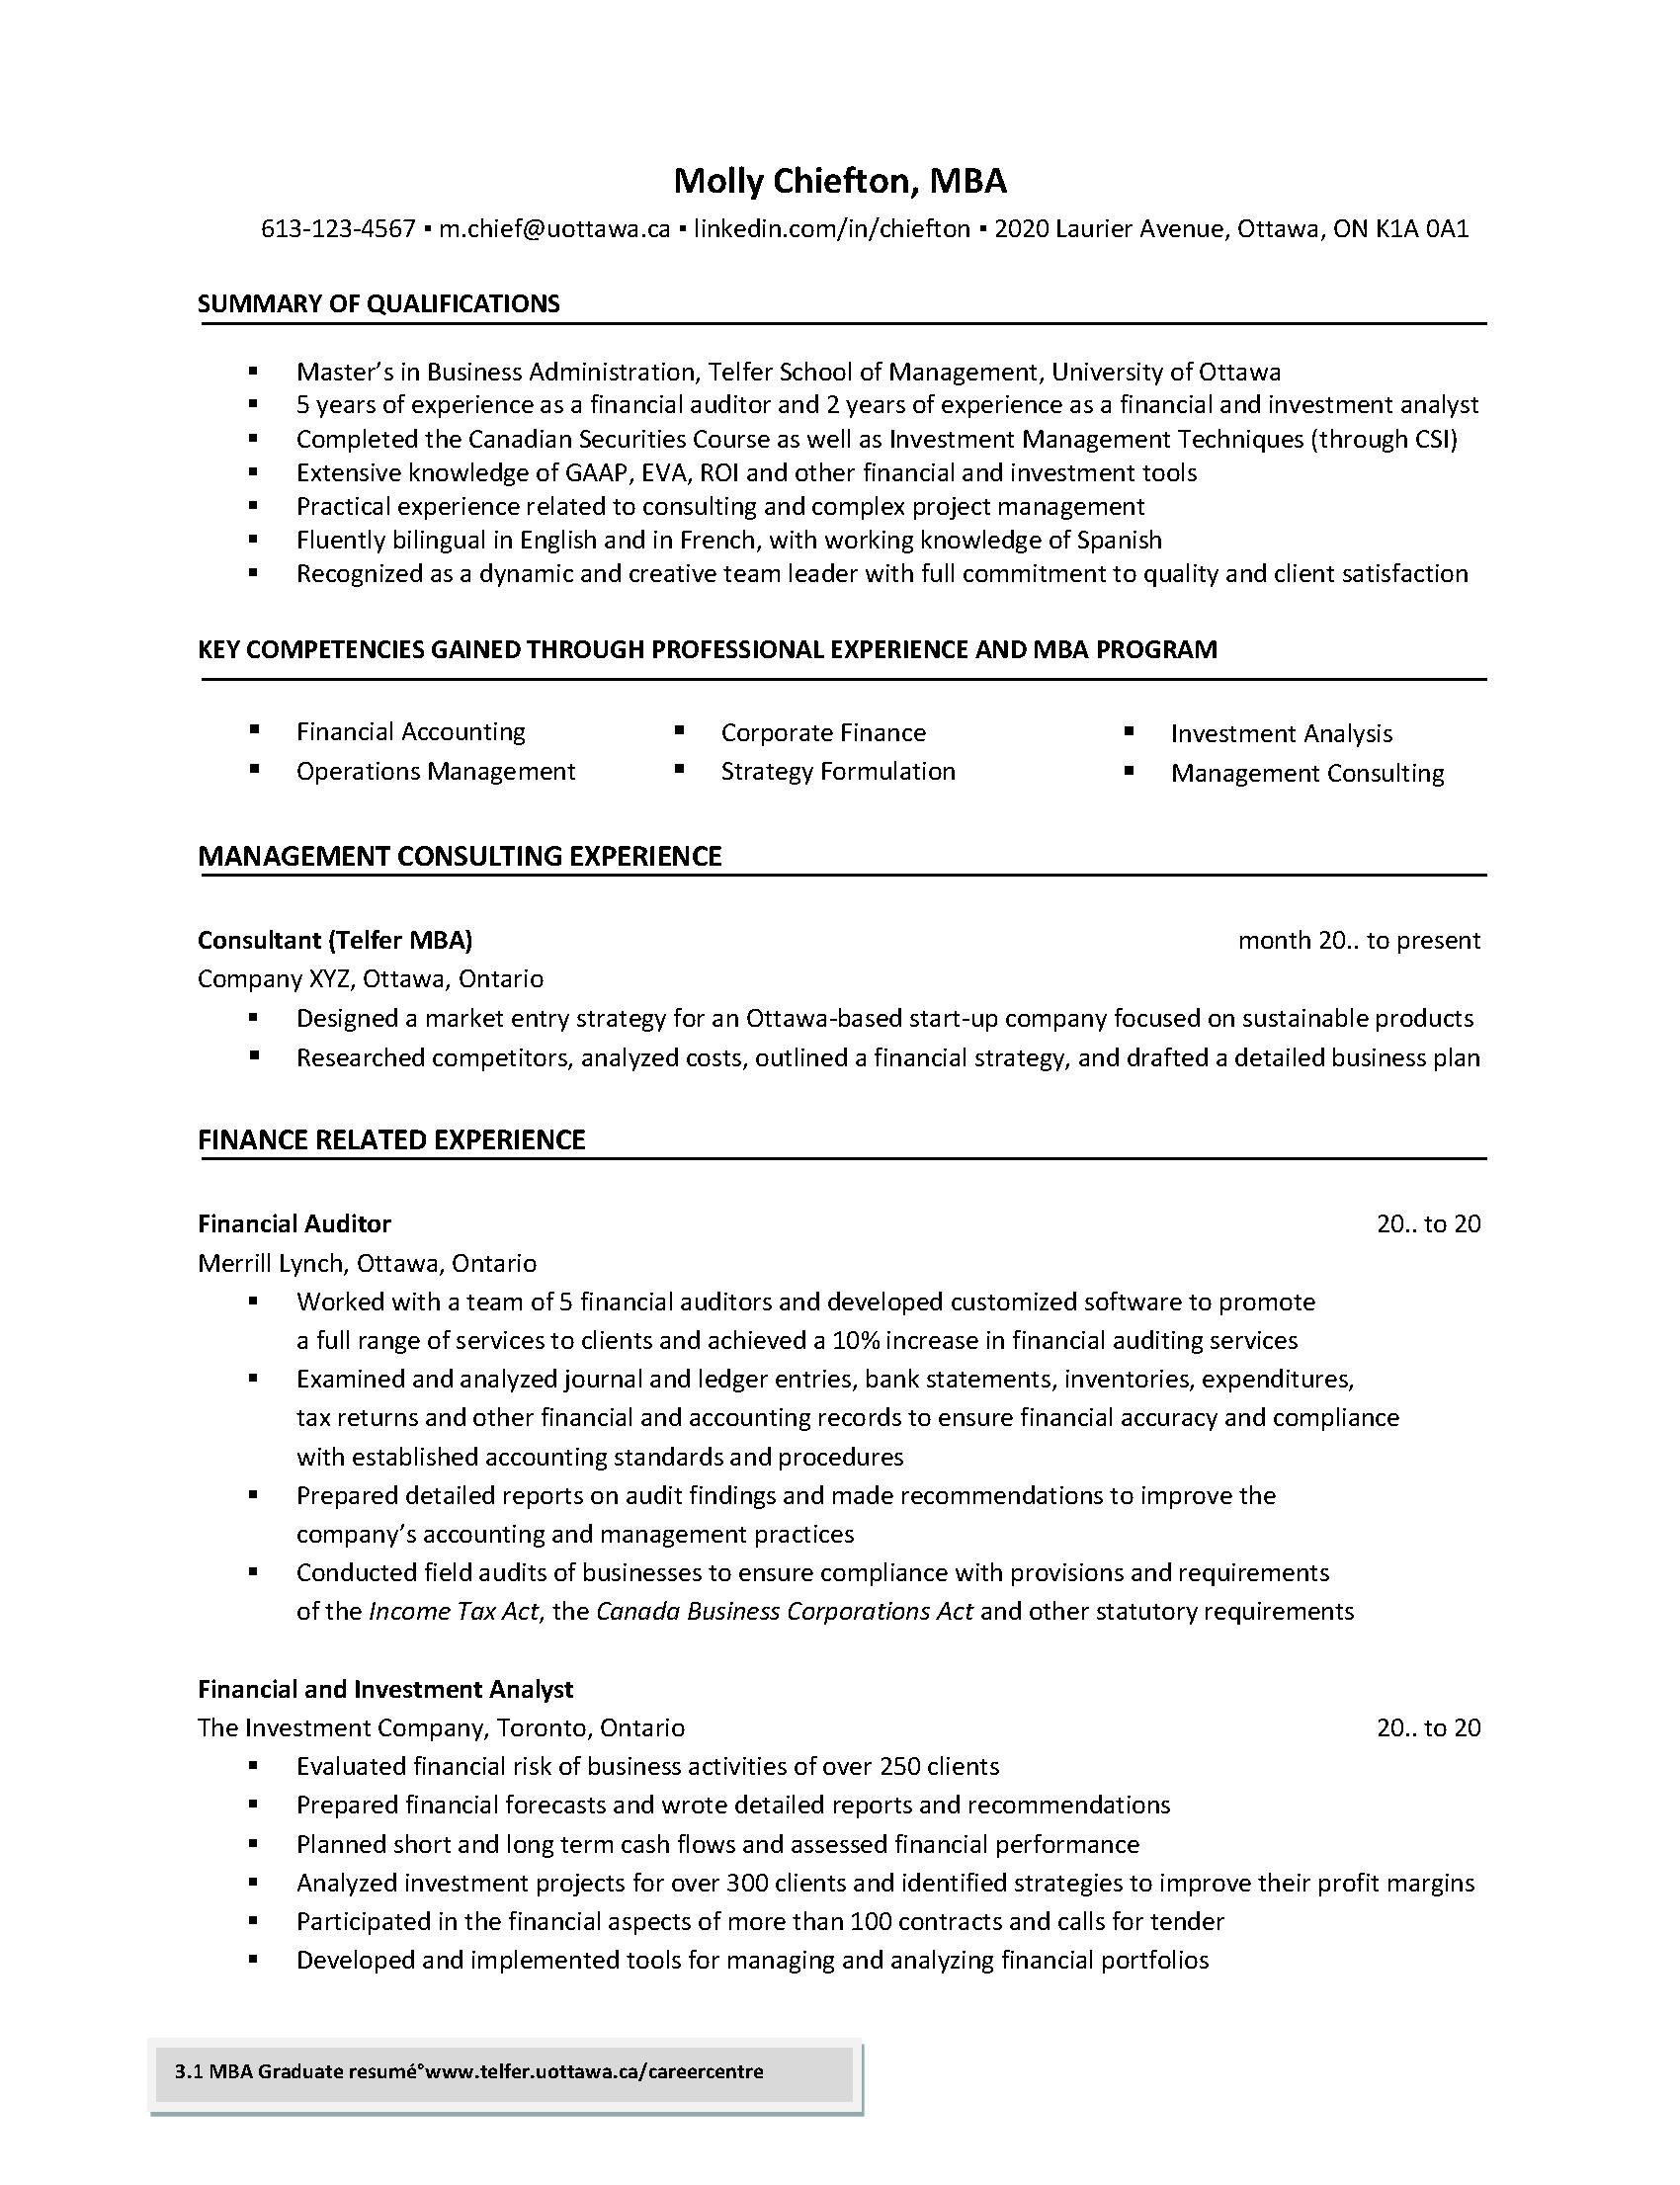 Effective Resume Examples | Resume Telfer School Of Management